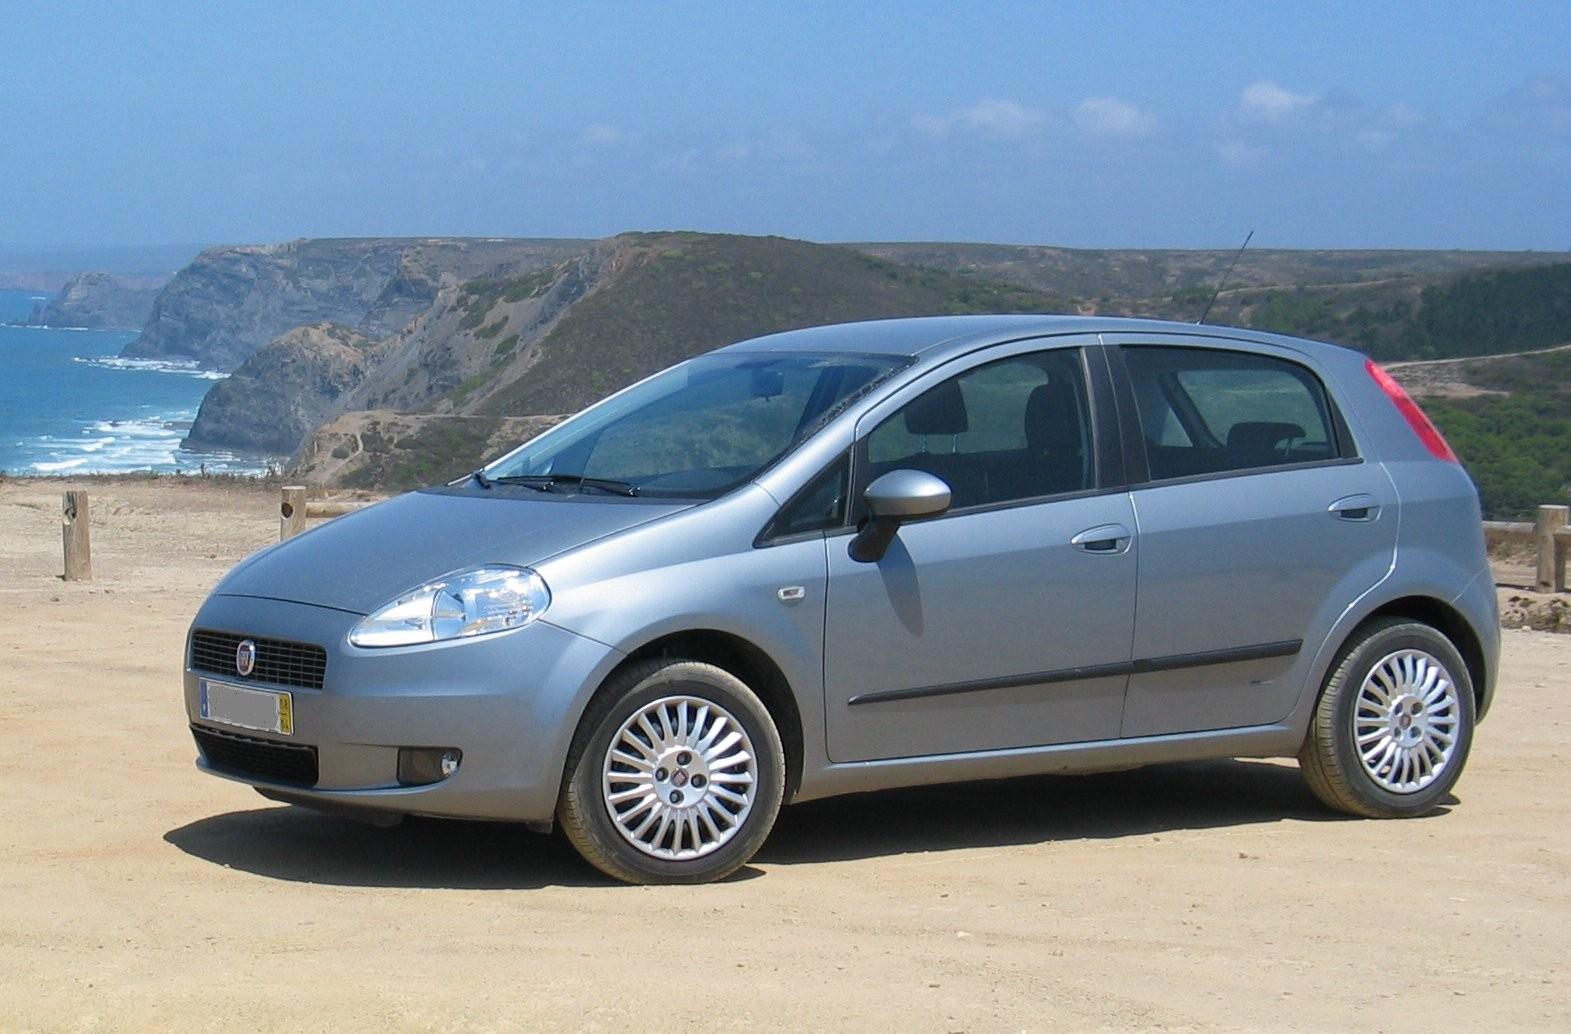 Fiat Seicento I Restyling 2005 - 2010 Hatchback 3 door #6